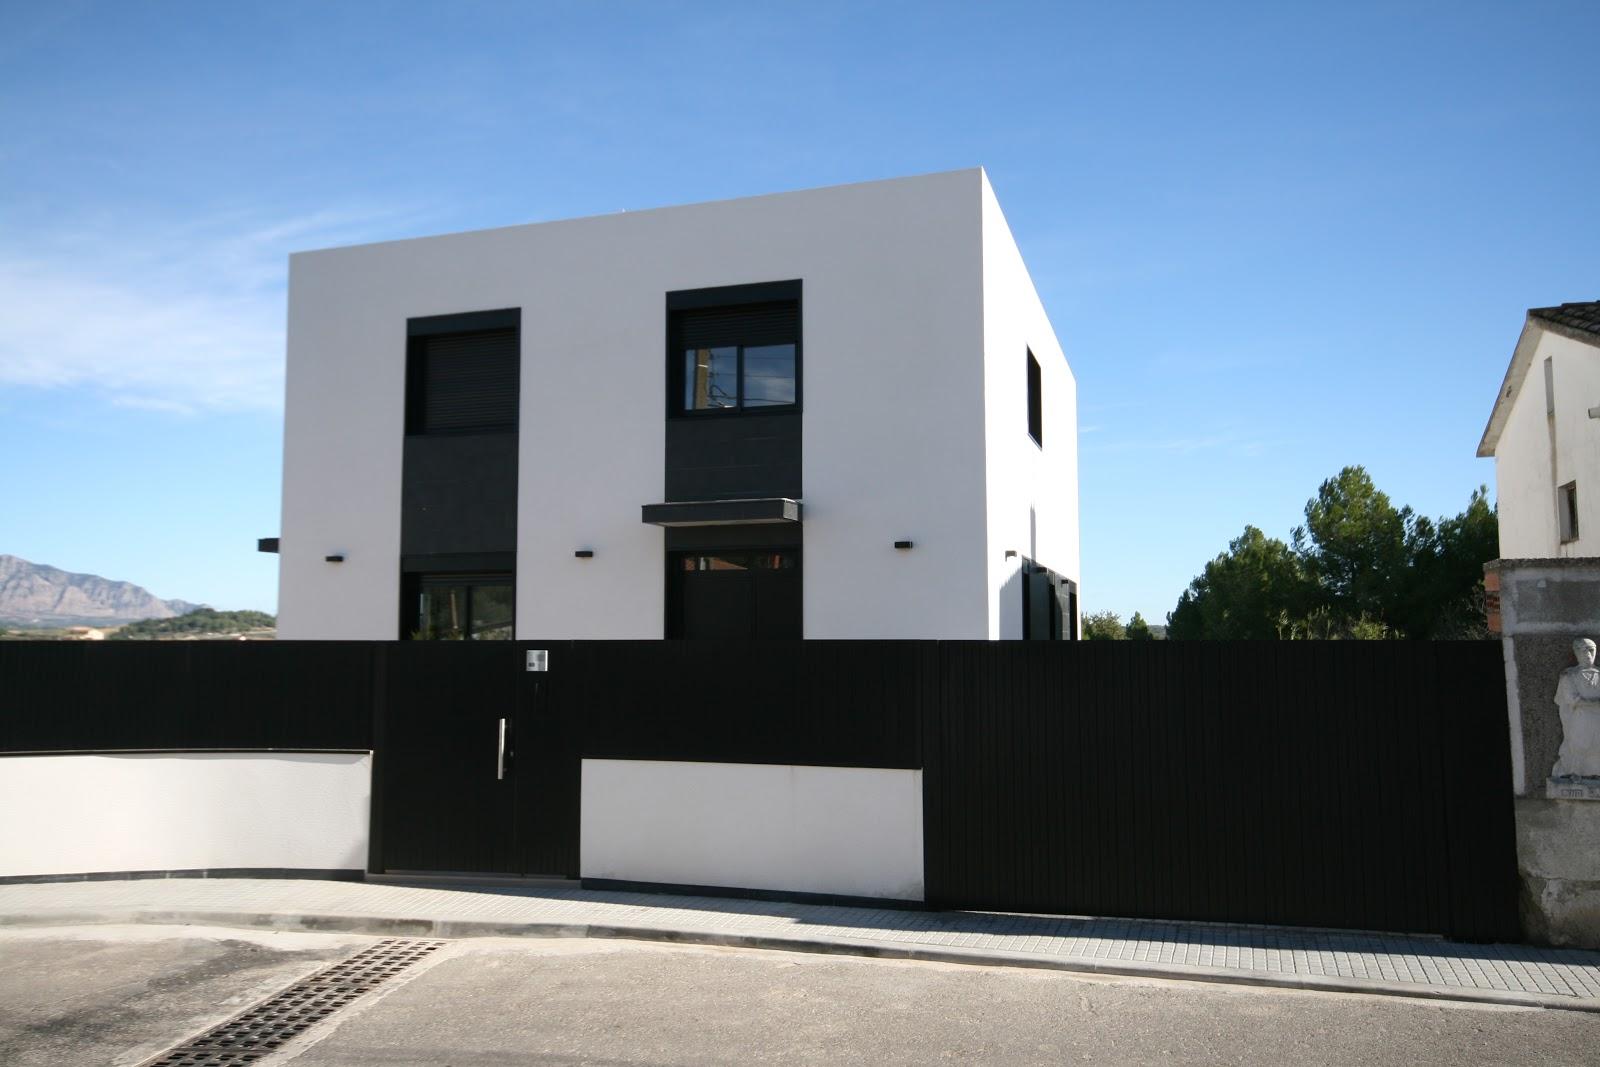 Rustica internacional ventajas de una vivienda modular for Viviendas modulares diseno